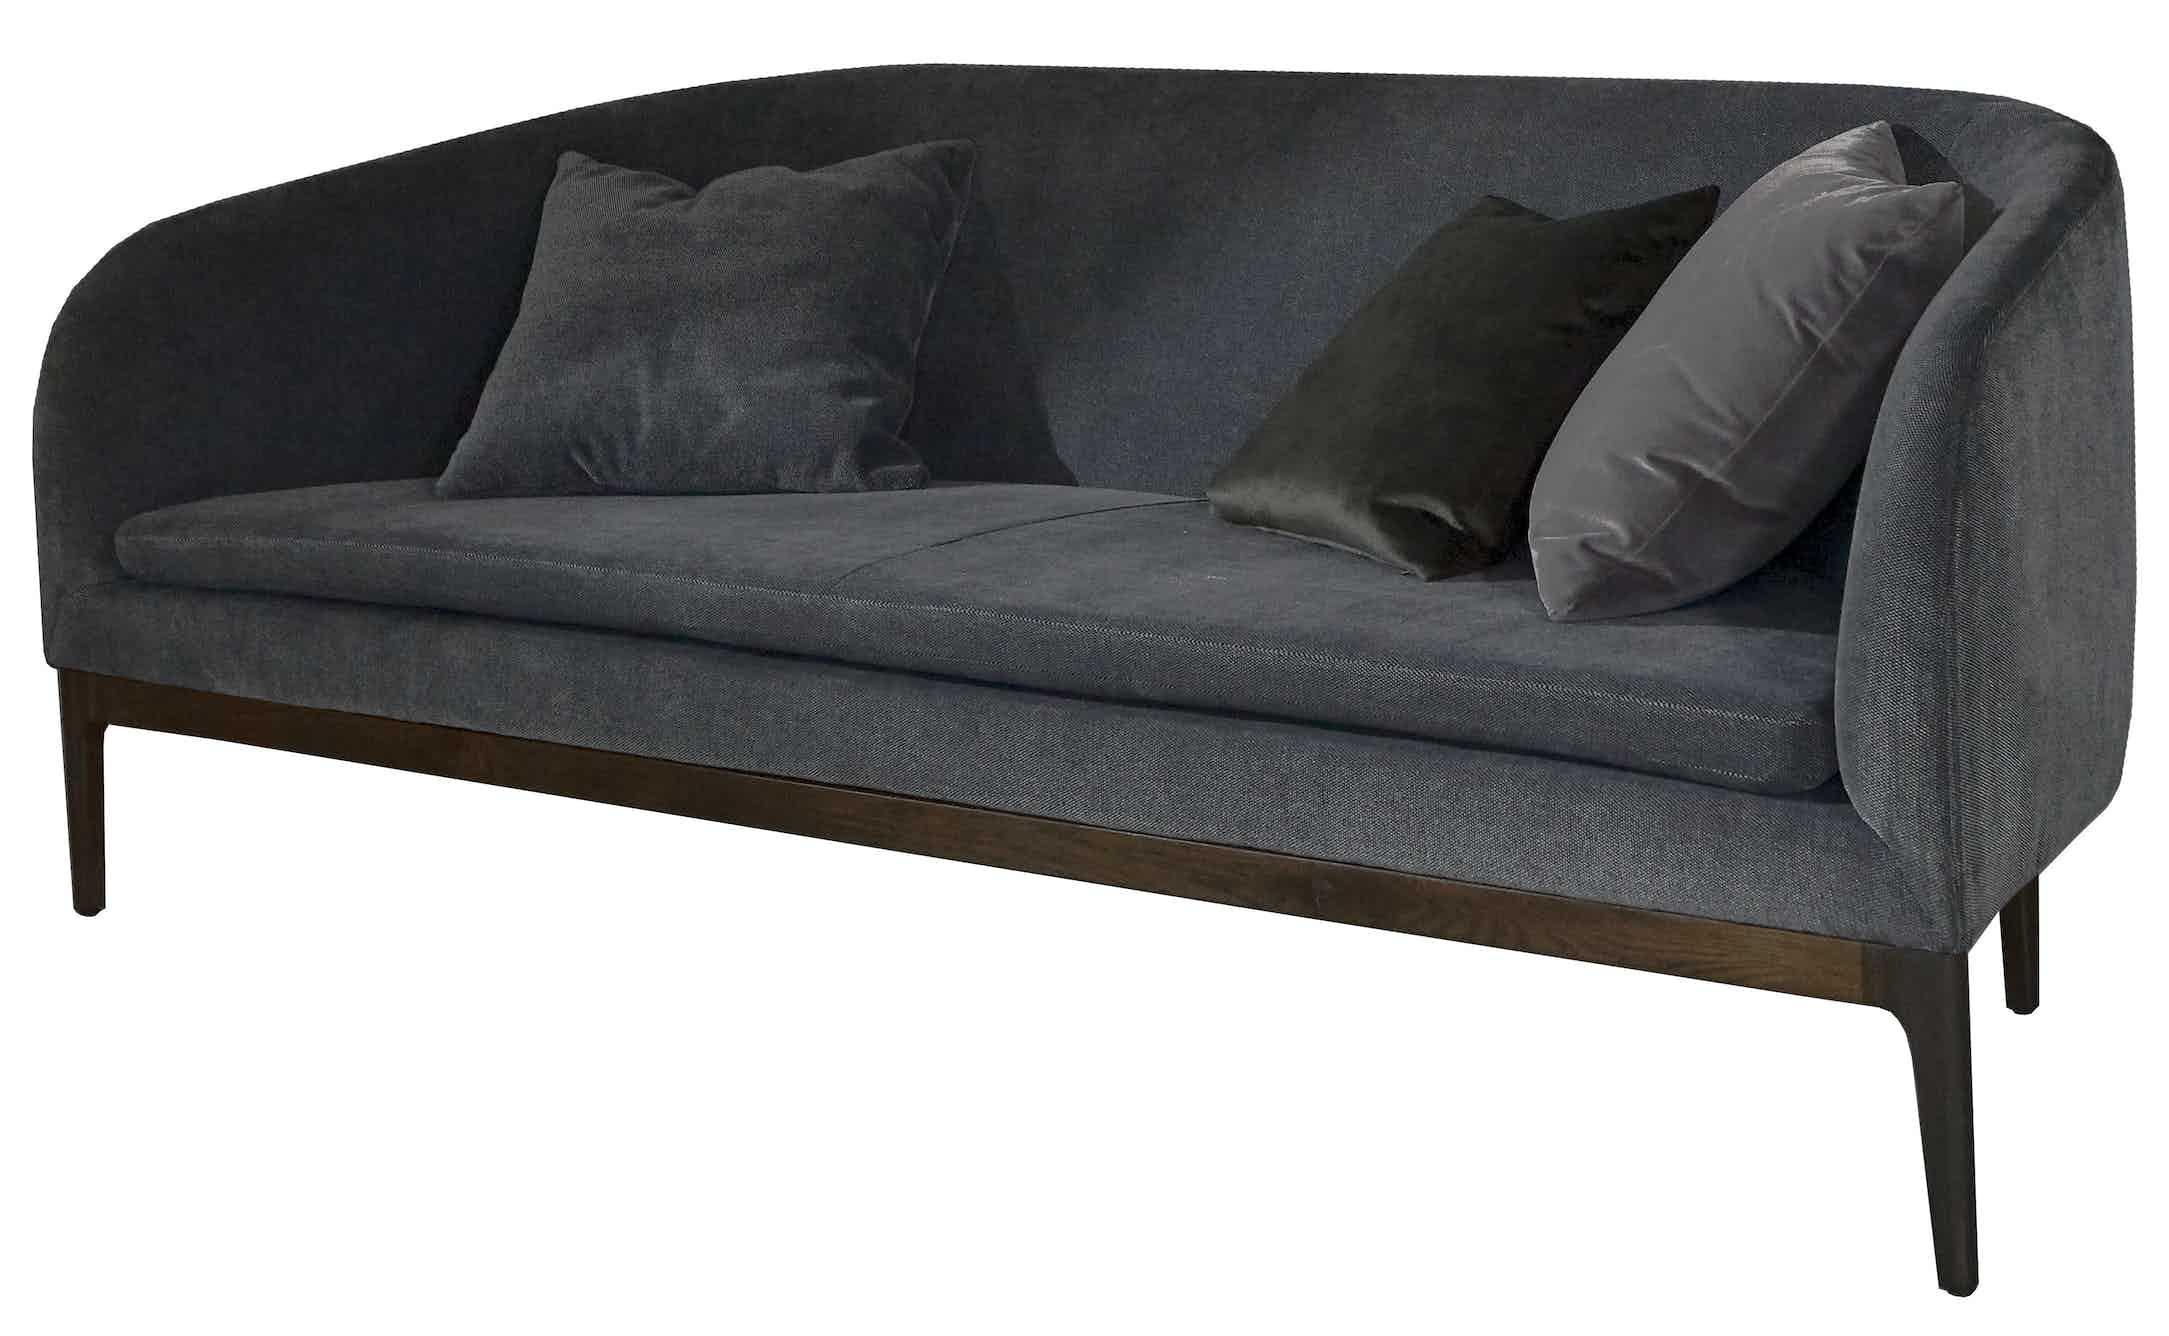 Wendelbo-navy-boomerang-sofa-haute-living